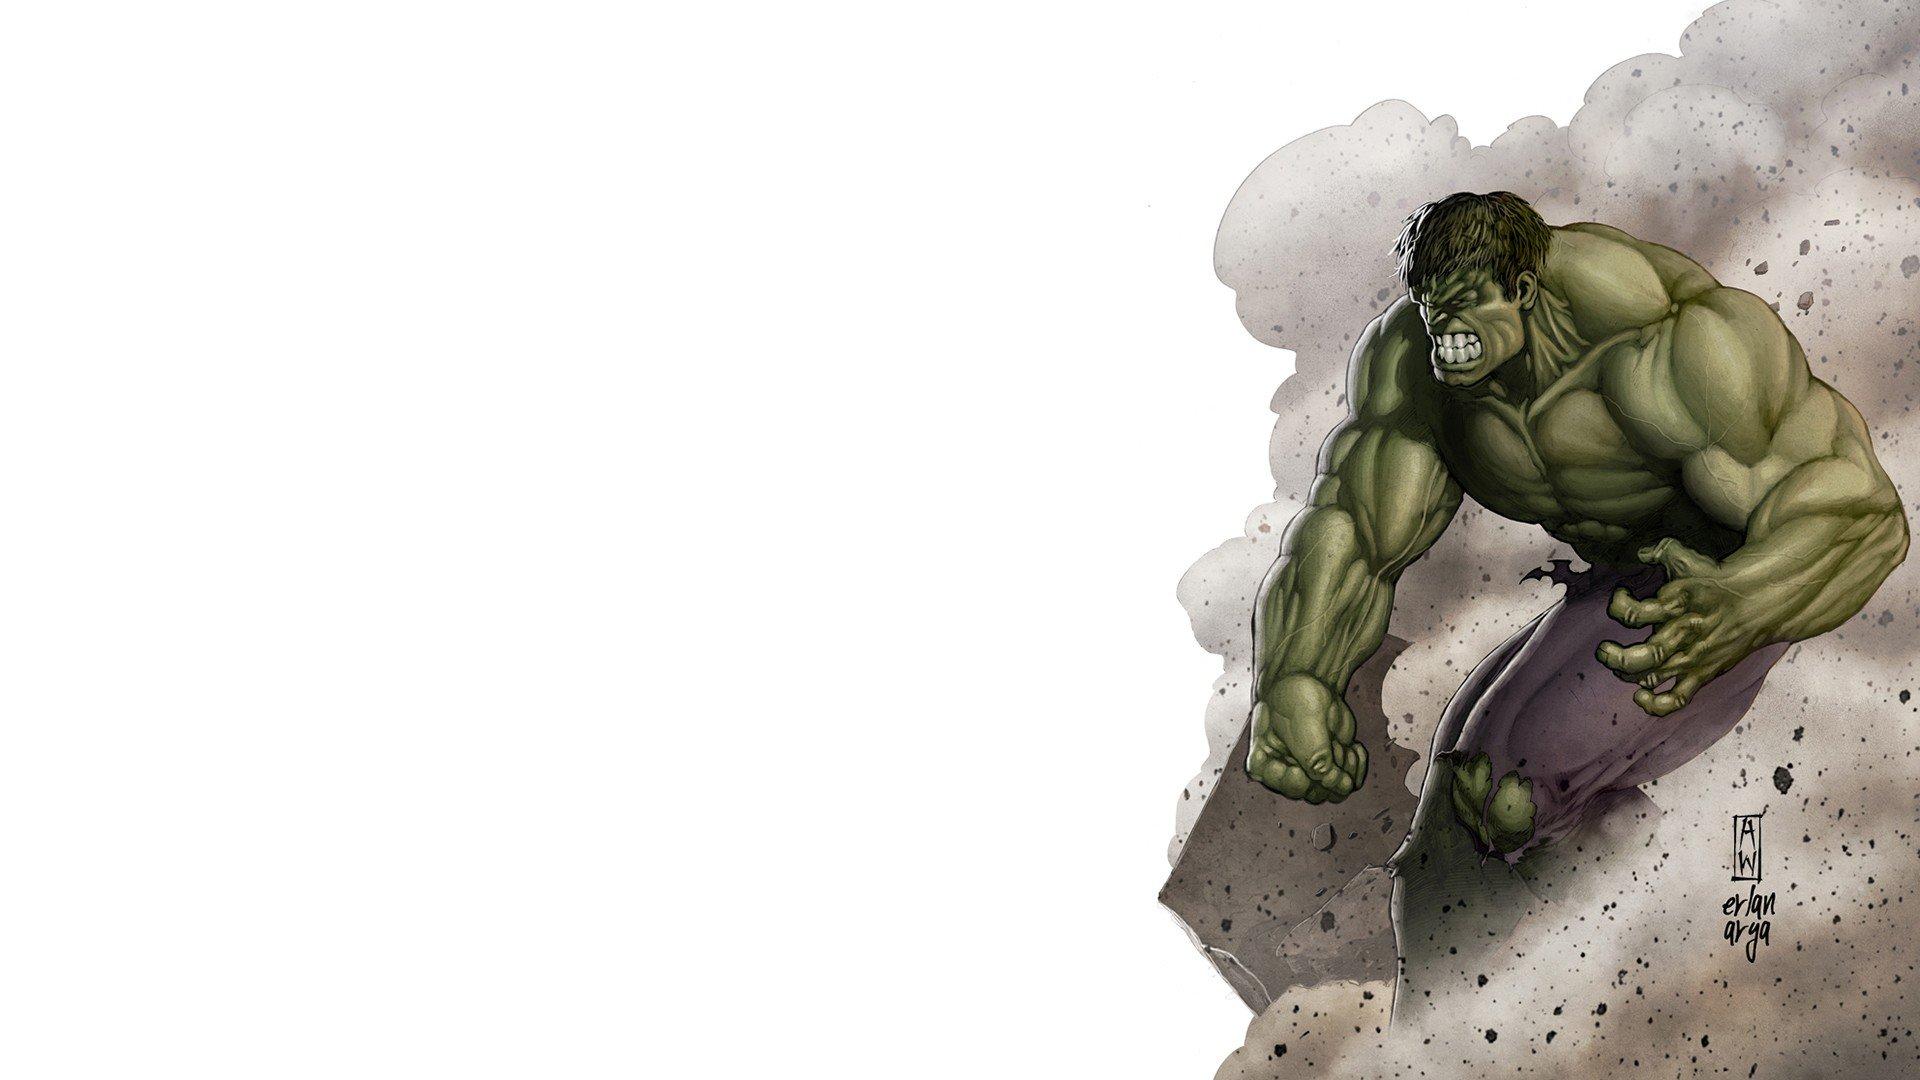 Hulk comic character Marvel Comics angry wallpaper 1920x1080 1920x1080